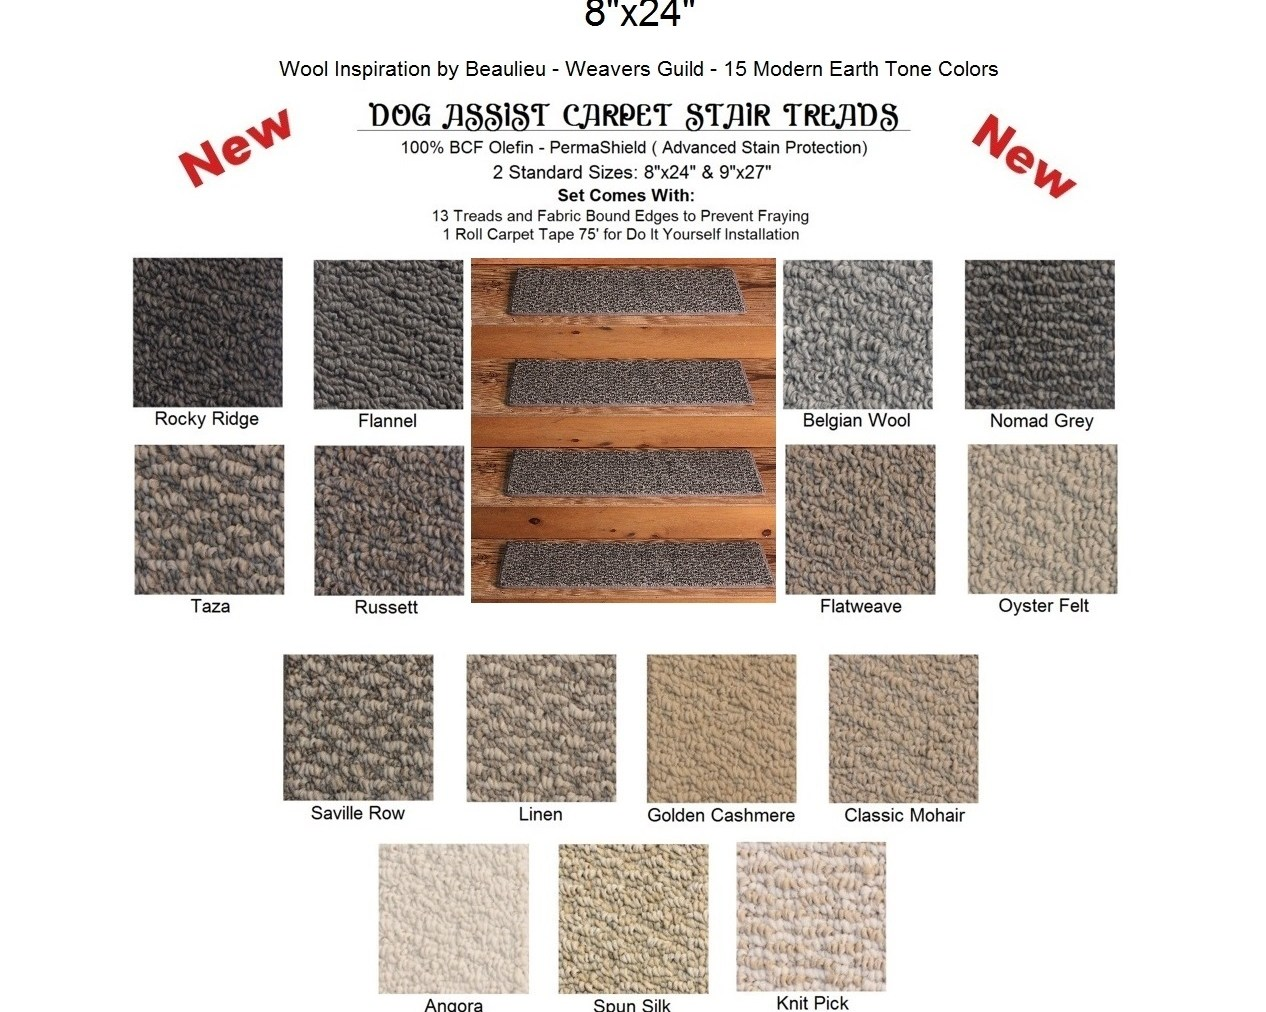 Dog Treads Dog Stair Treads Weavers Guild Dog Assist Stair Treads | Wool Carpet Stair Treads | Flooring | Zealand Wool | Beige Carpet | Cat Pet | Hardwood Stairs